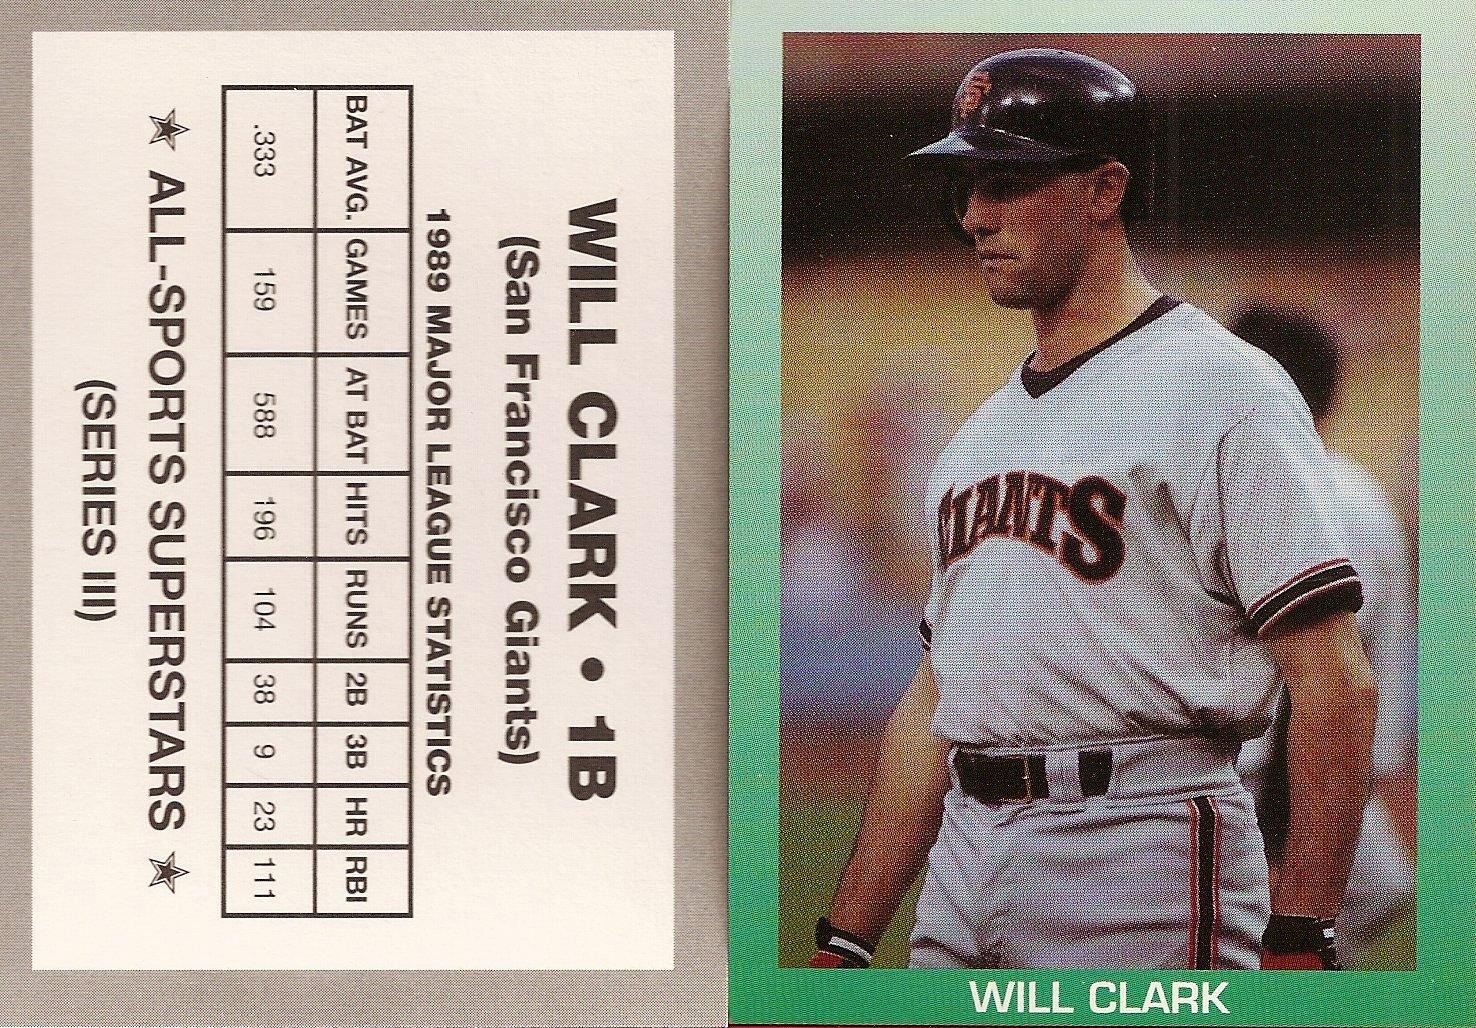 1990 All-Sports Superstars Series III